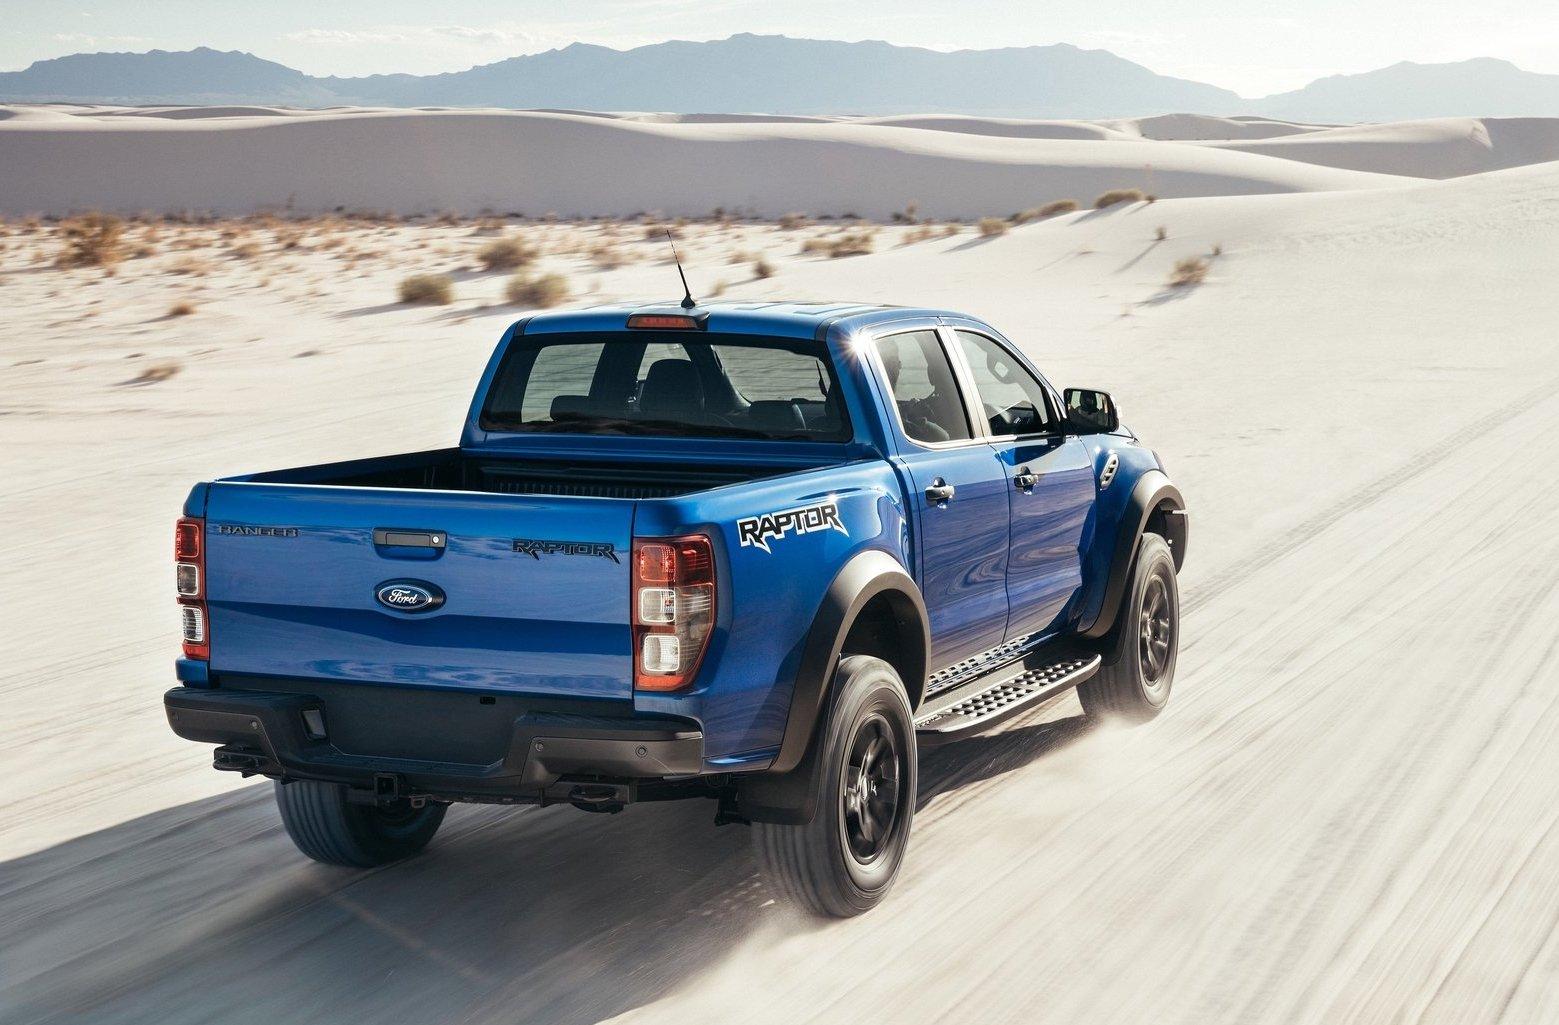 Ford Ranger Raptor Vs Hsv Colorado Sportscat Vs Toyota Hilux Rugged